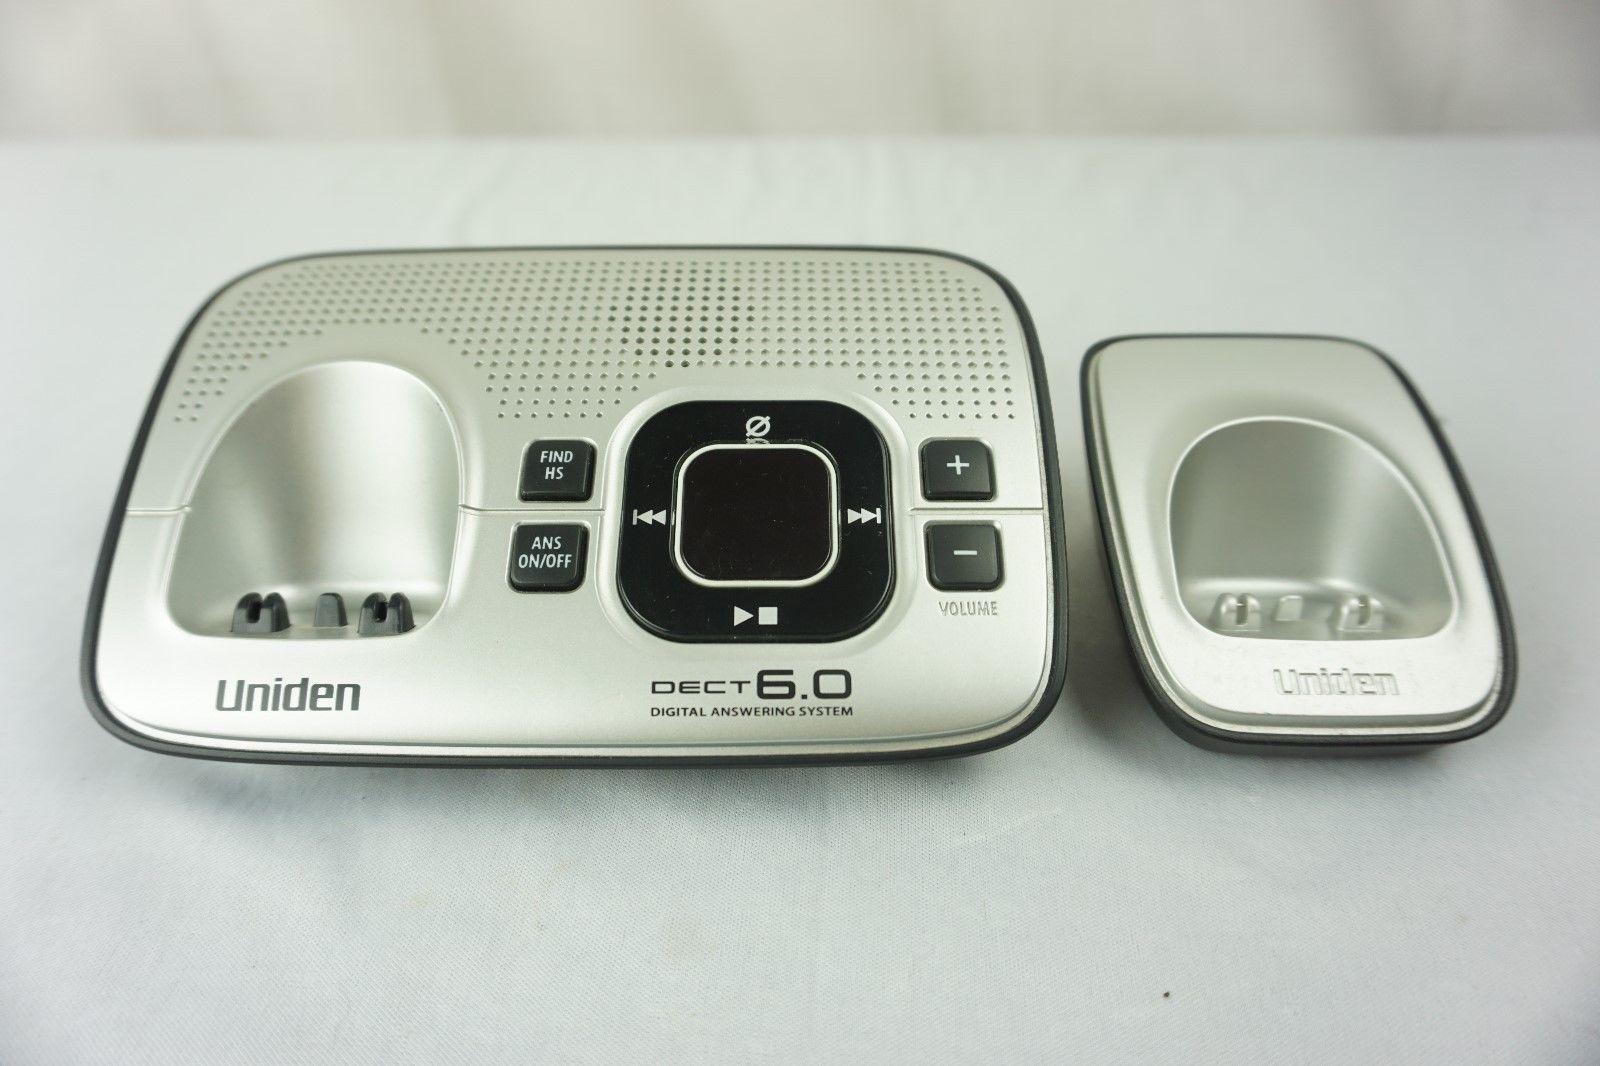 Uniden D1680-3 DECT 6.0 Cordless Phone Answering System 3 Handsets Expandable image 3